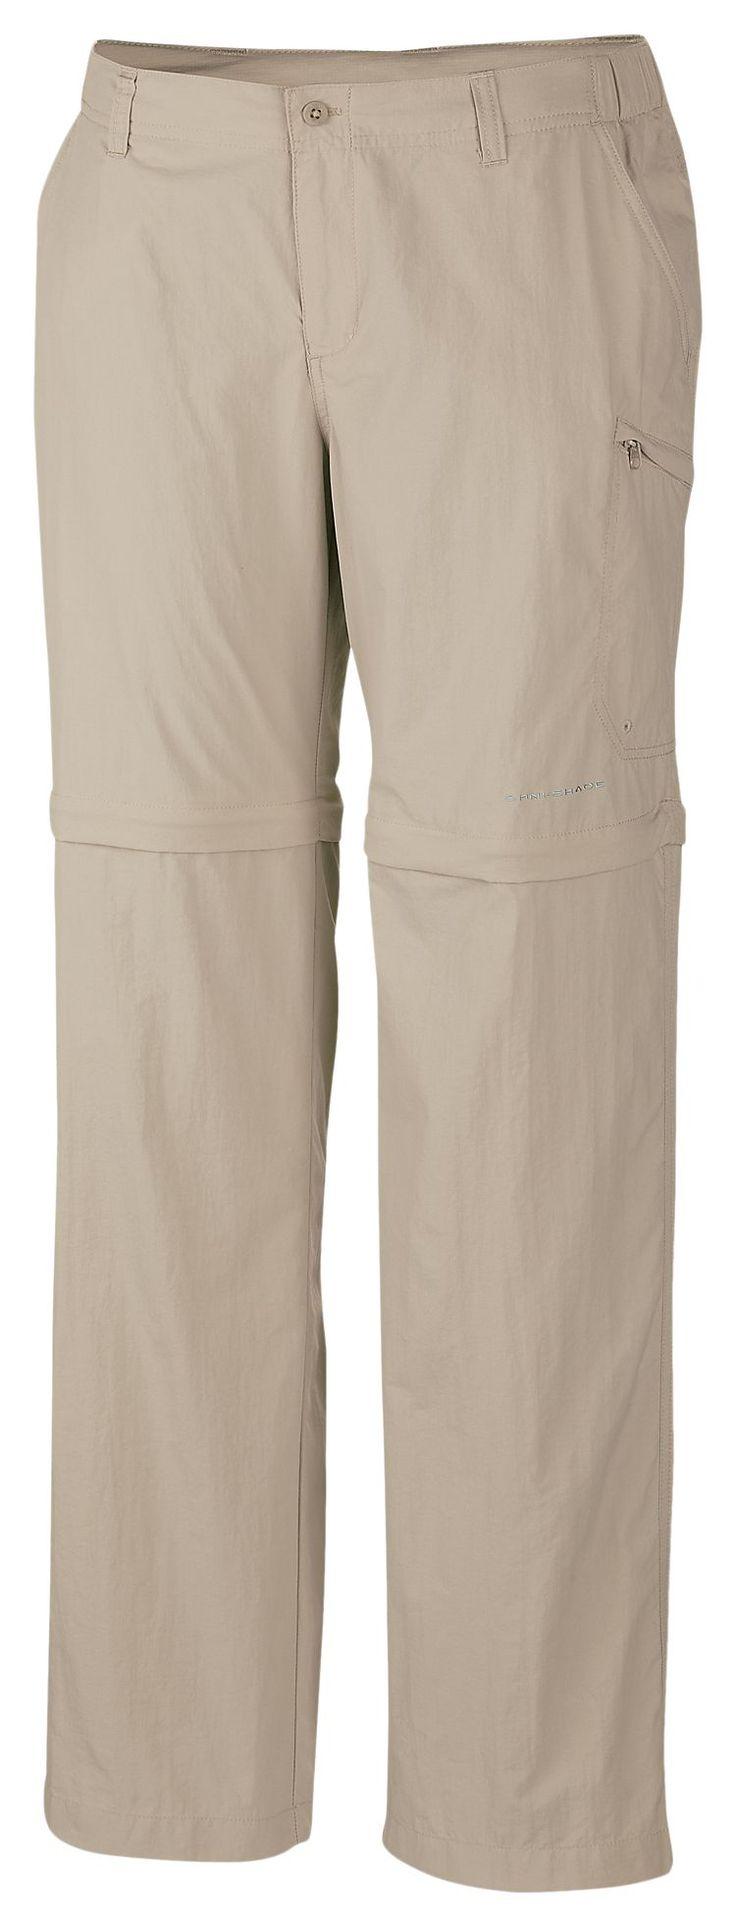 Columbia® Aruba™ Convertible Pants for Ladies   Bass Pro Shops